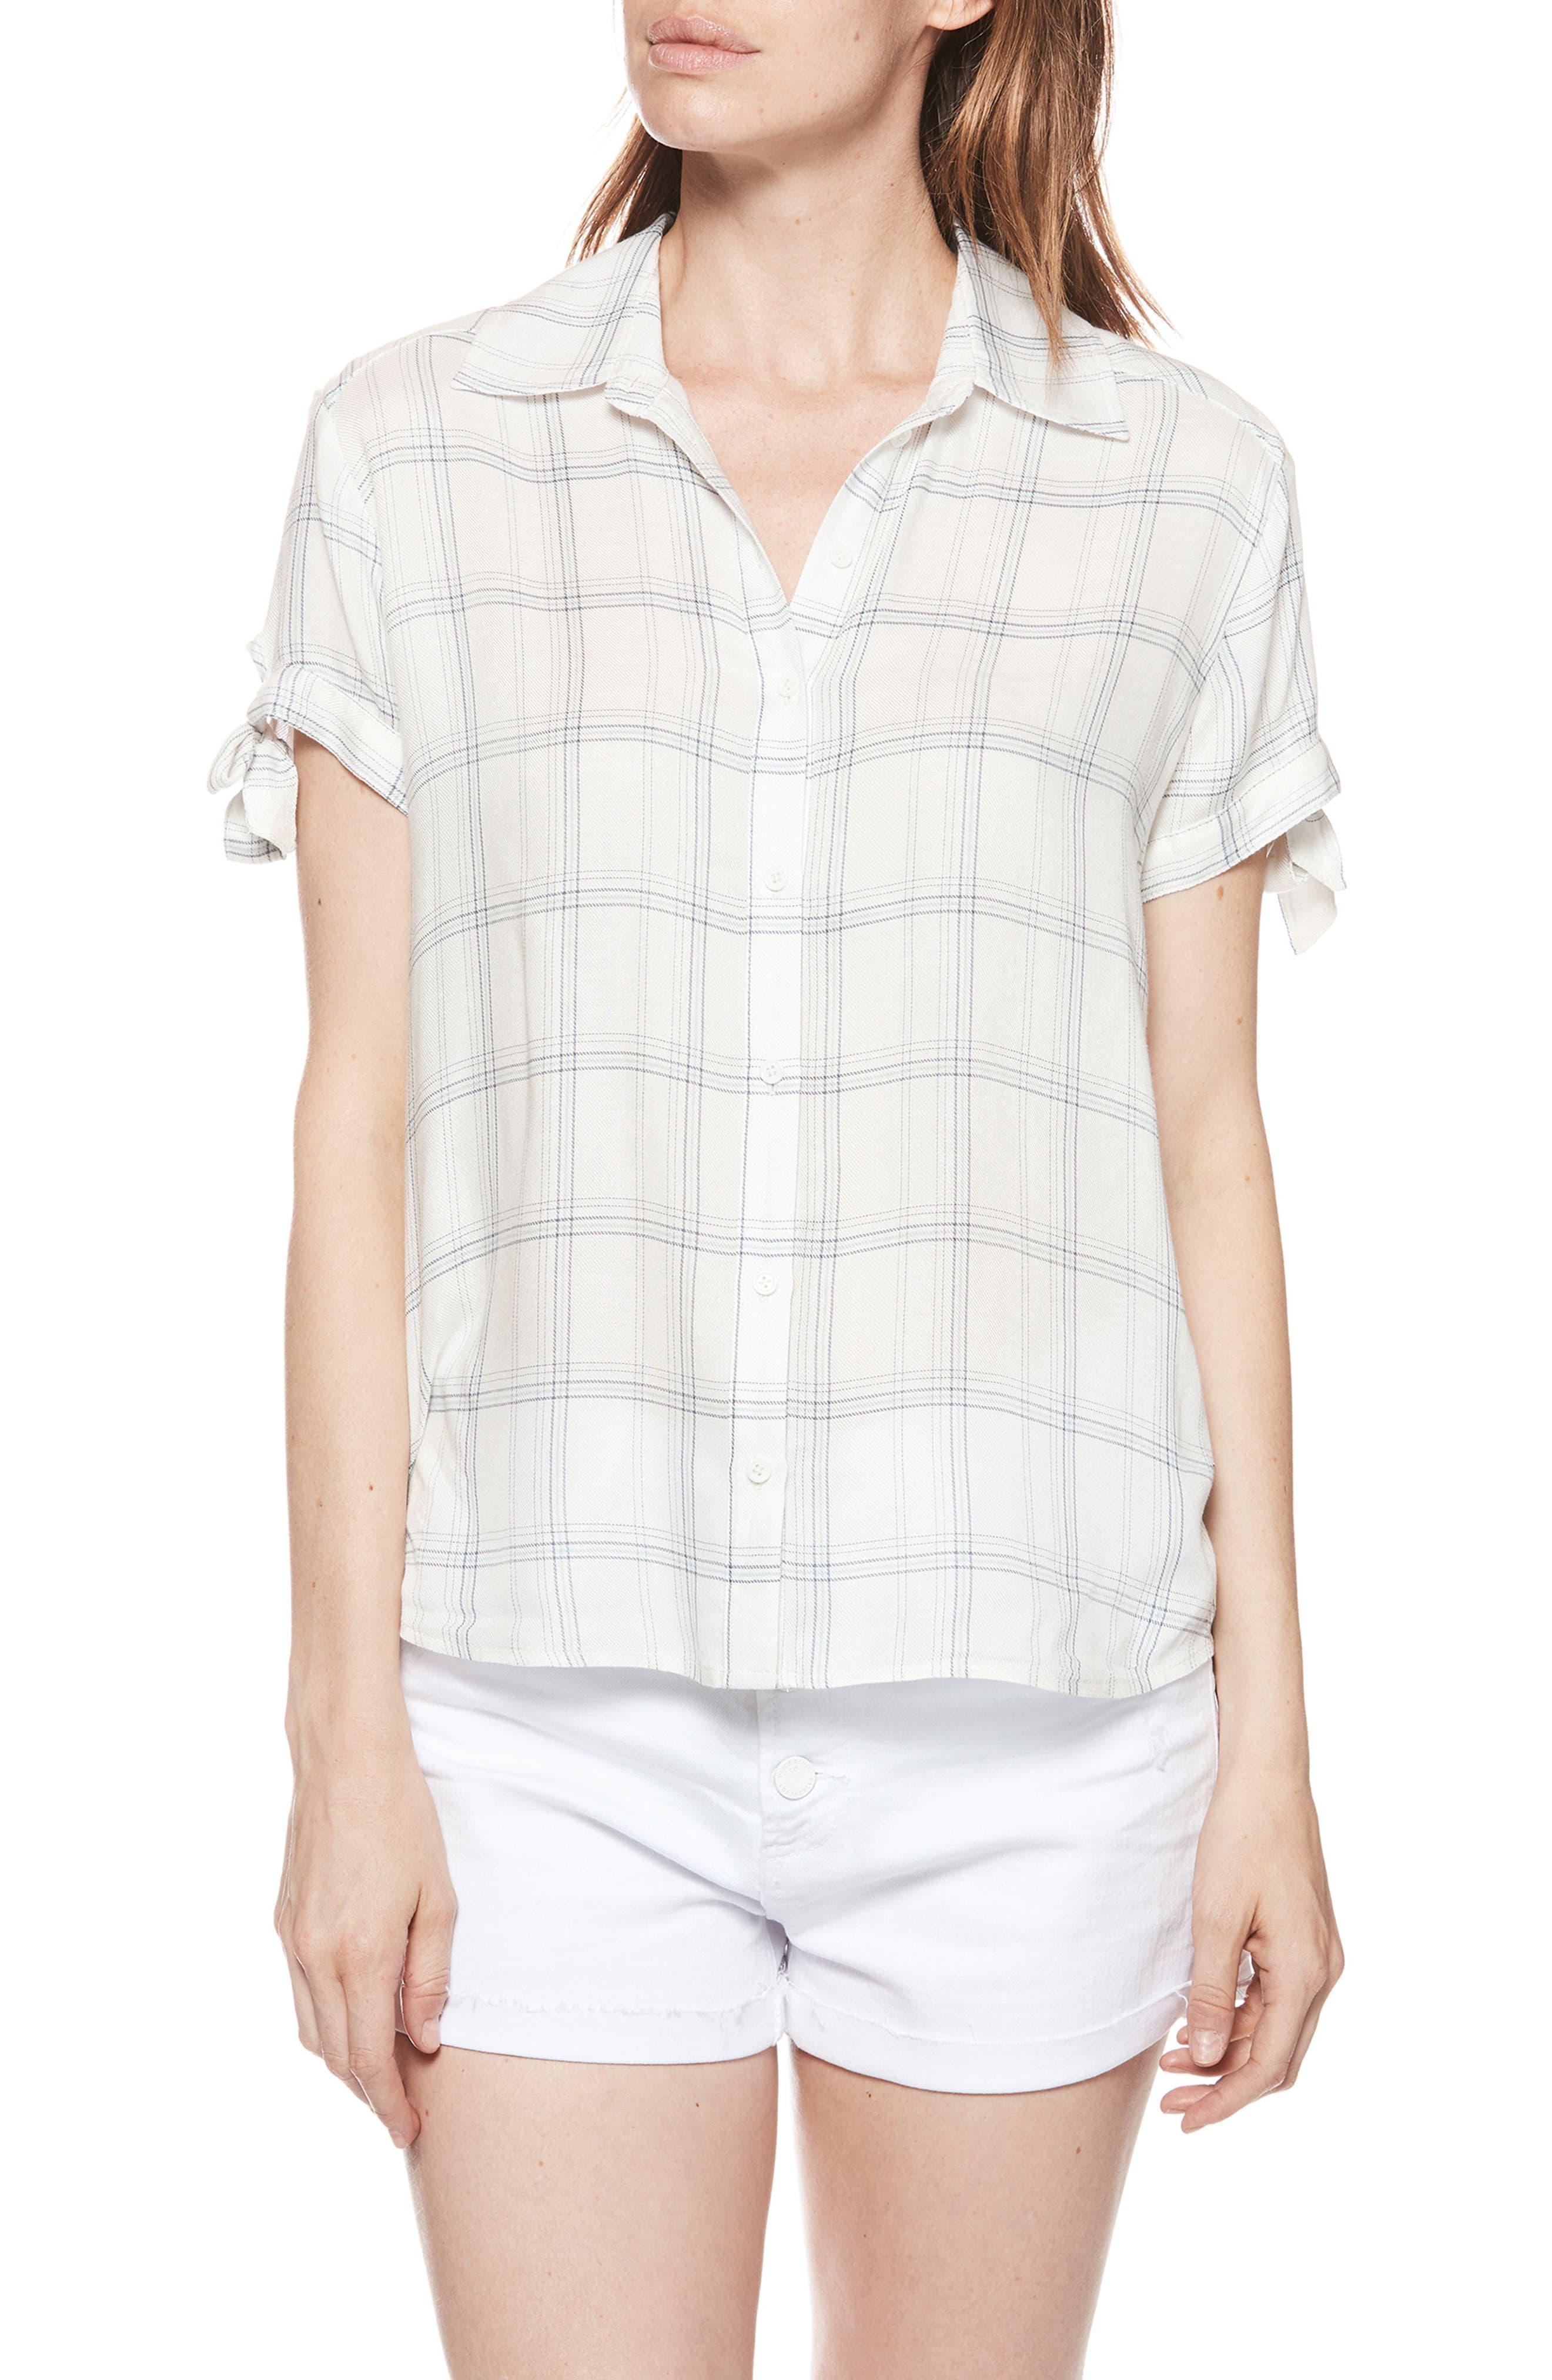 Avery Plaid Shirt,                             Main thumbnail 1, color,                             White / Bijou Blue